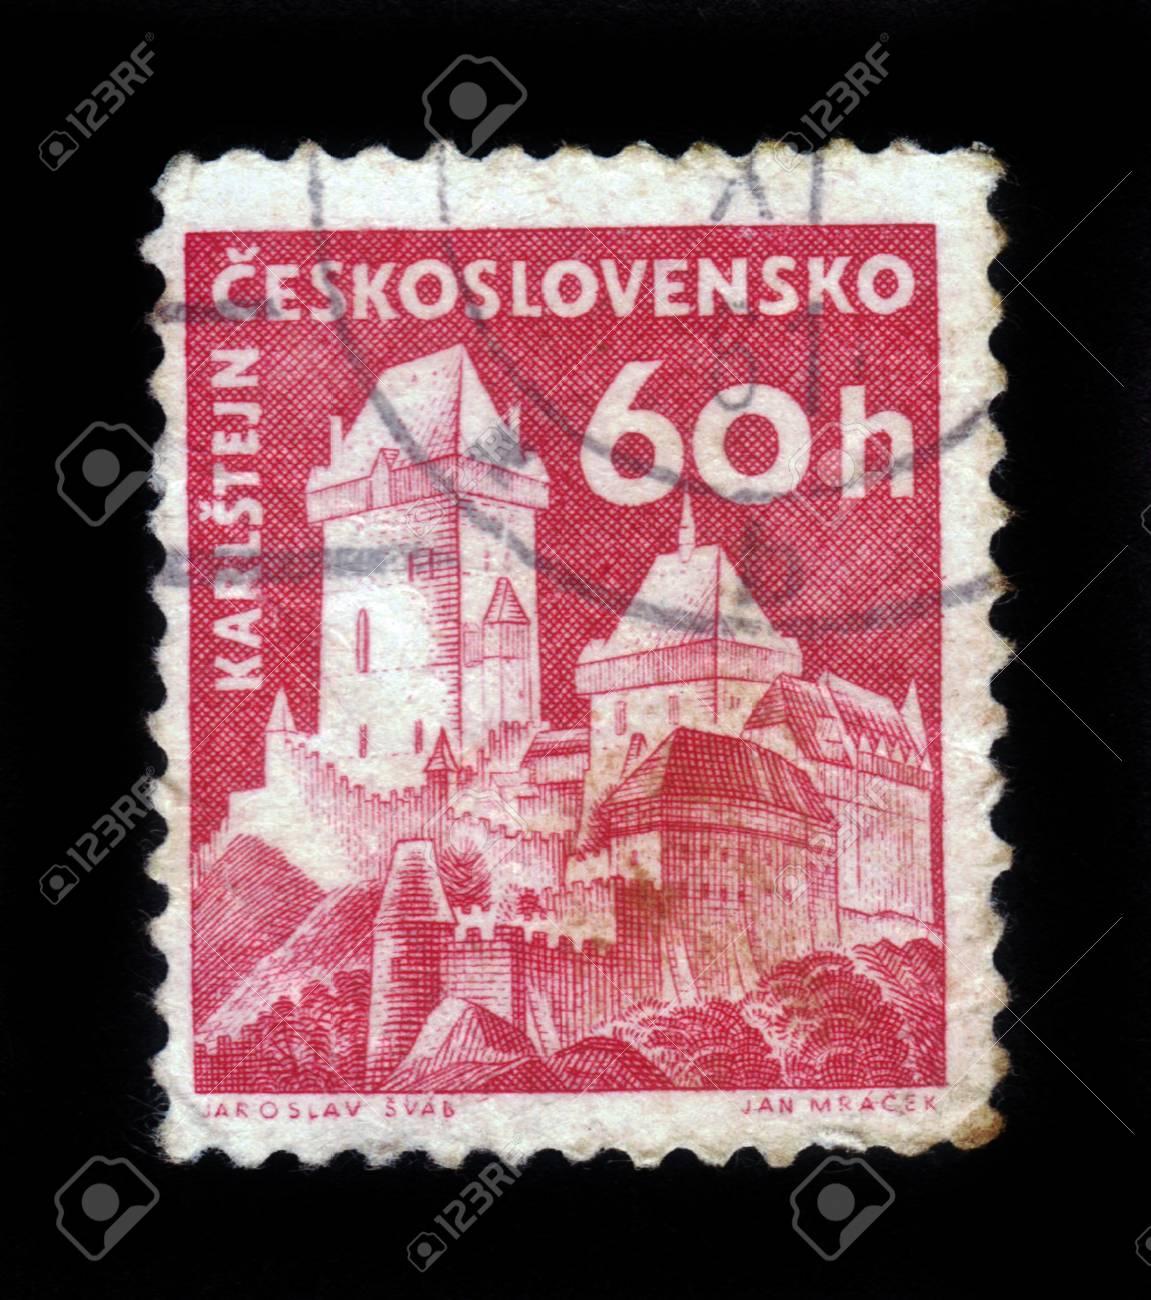 Czech Republic - CIRCA 1958: A stamp printed in Czechoslovakia shows image of Karlstejn Castle, series, circa 1958 Stock Photo - 17326957